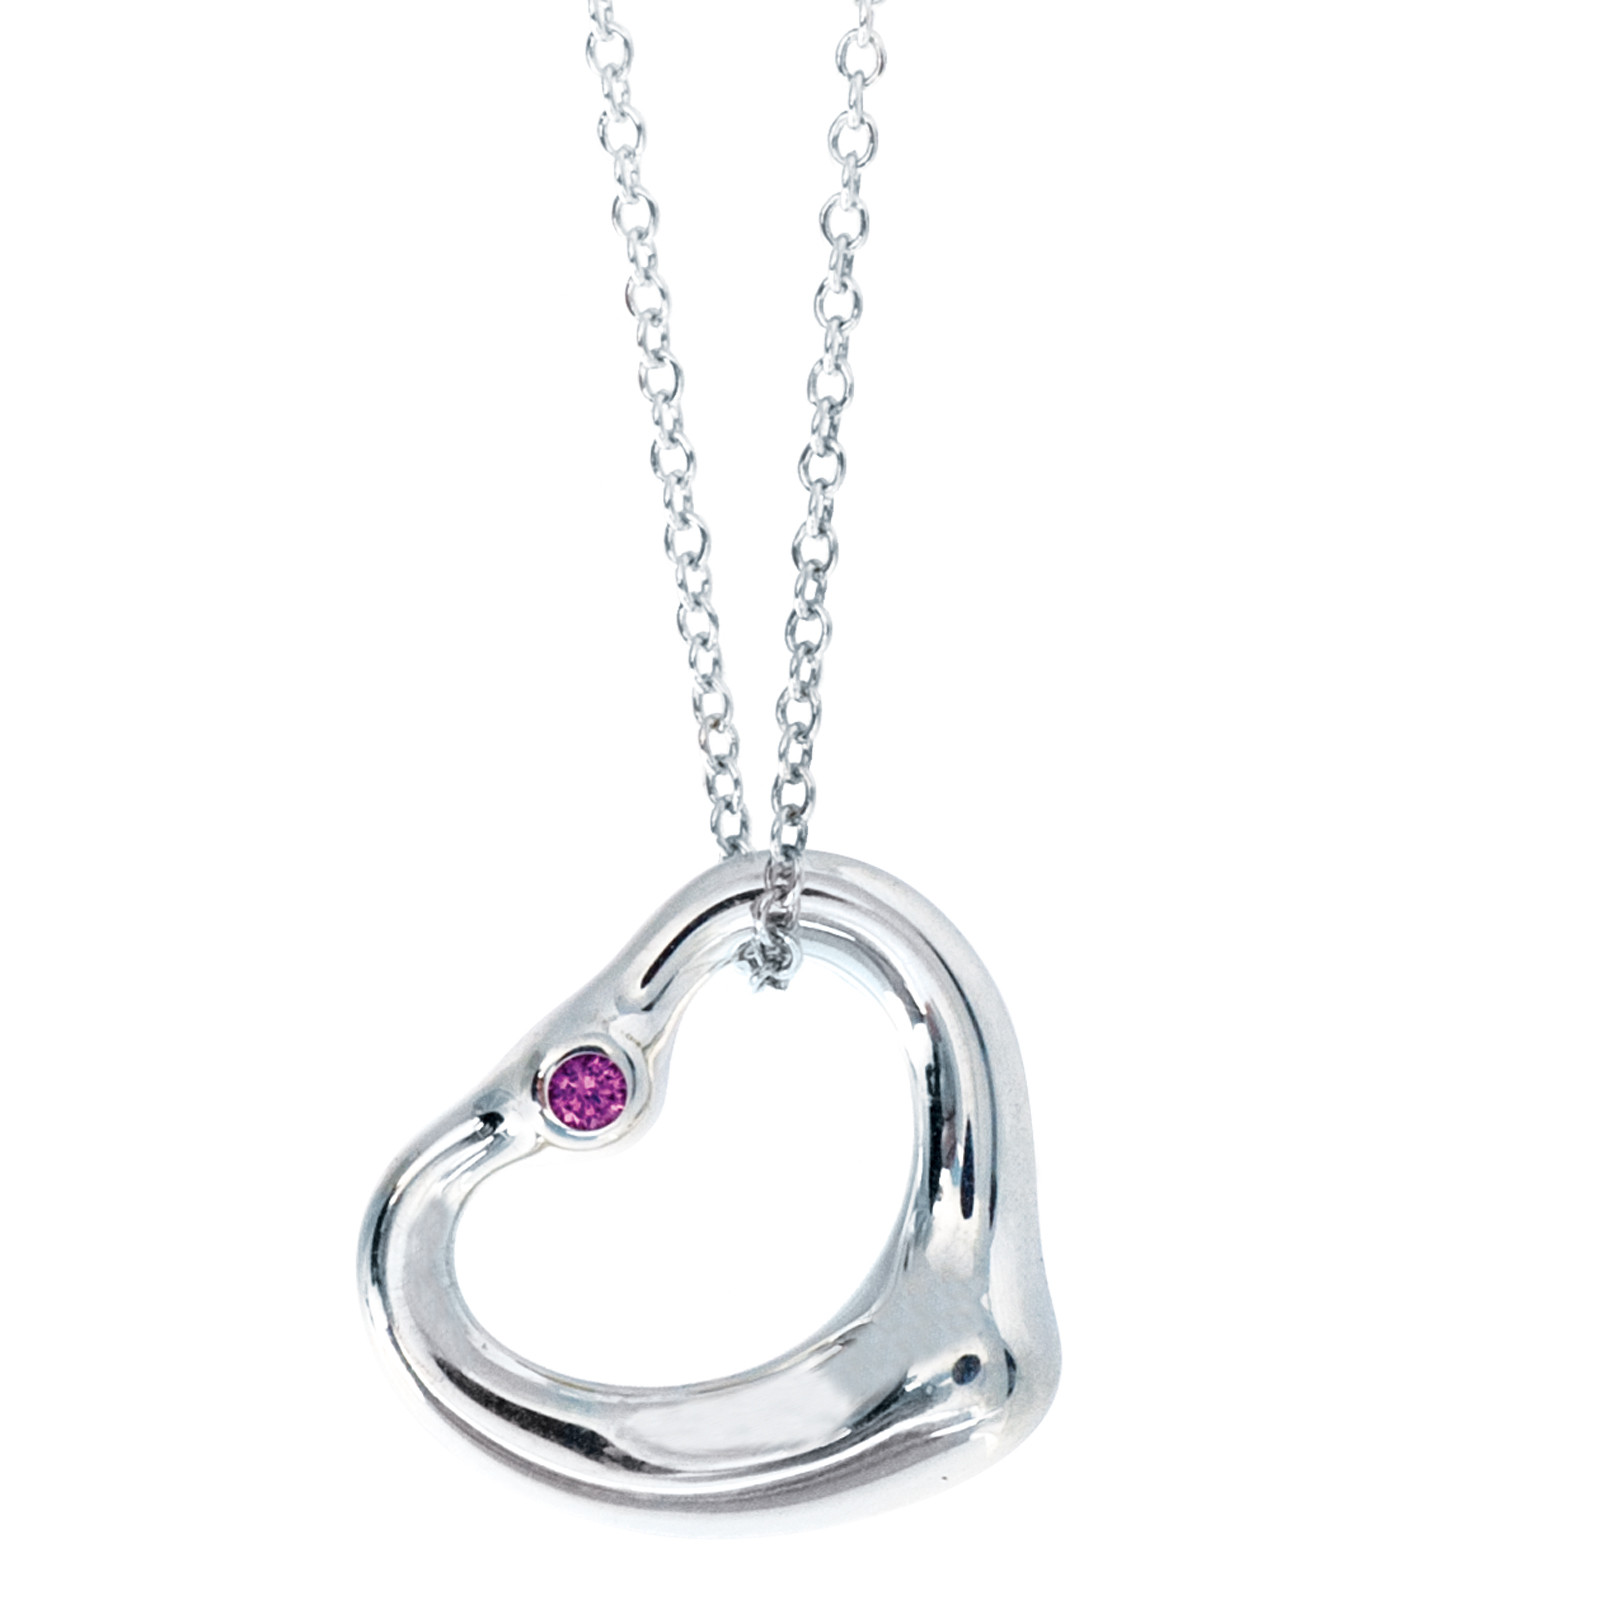 Vintage Tiffany & Co. Elsa Peretti Heart Necklace